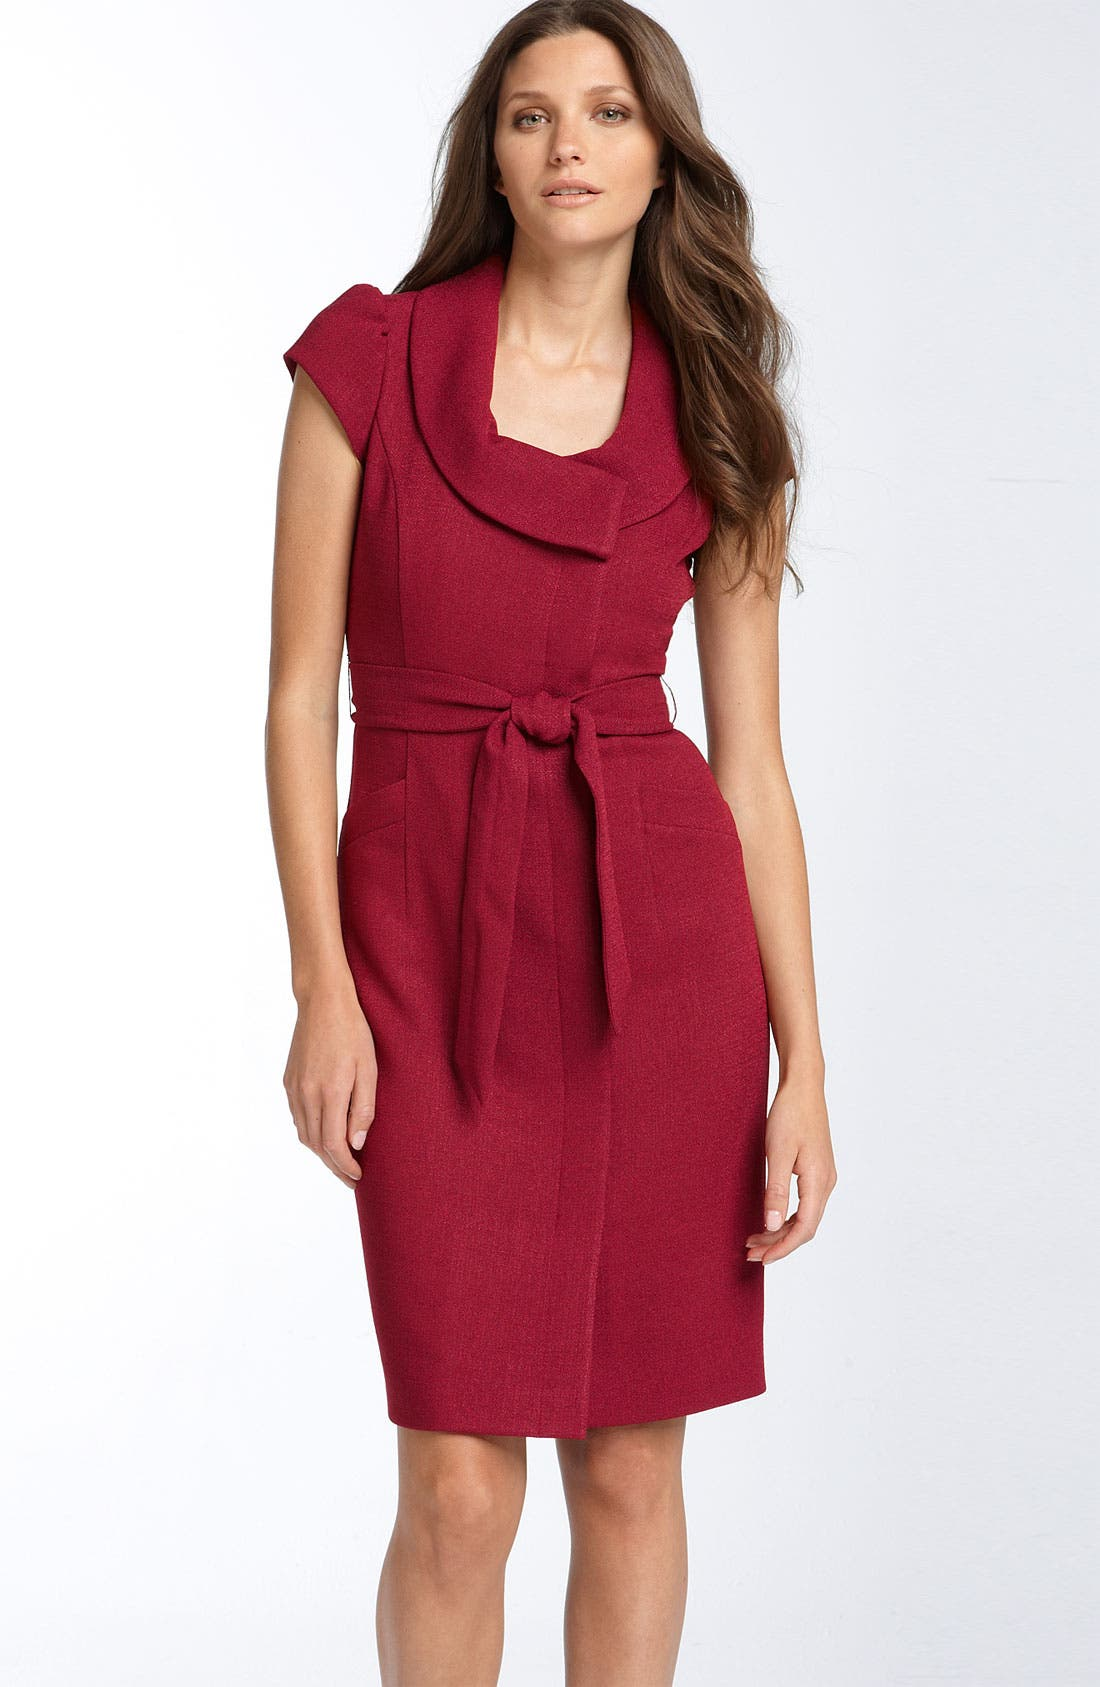 Alternate Image 1 Selected - Classiques Entier® 'Caprice' Cap Sleeve Crepe Dress